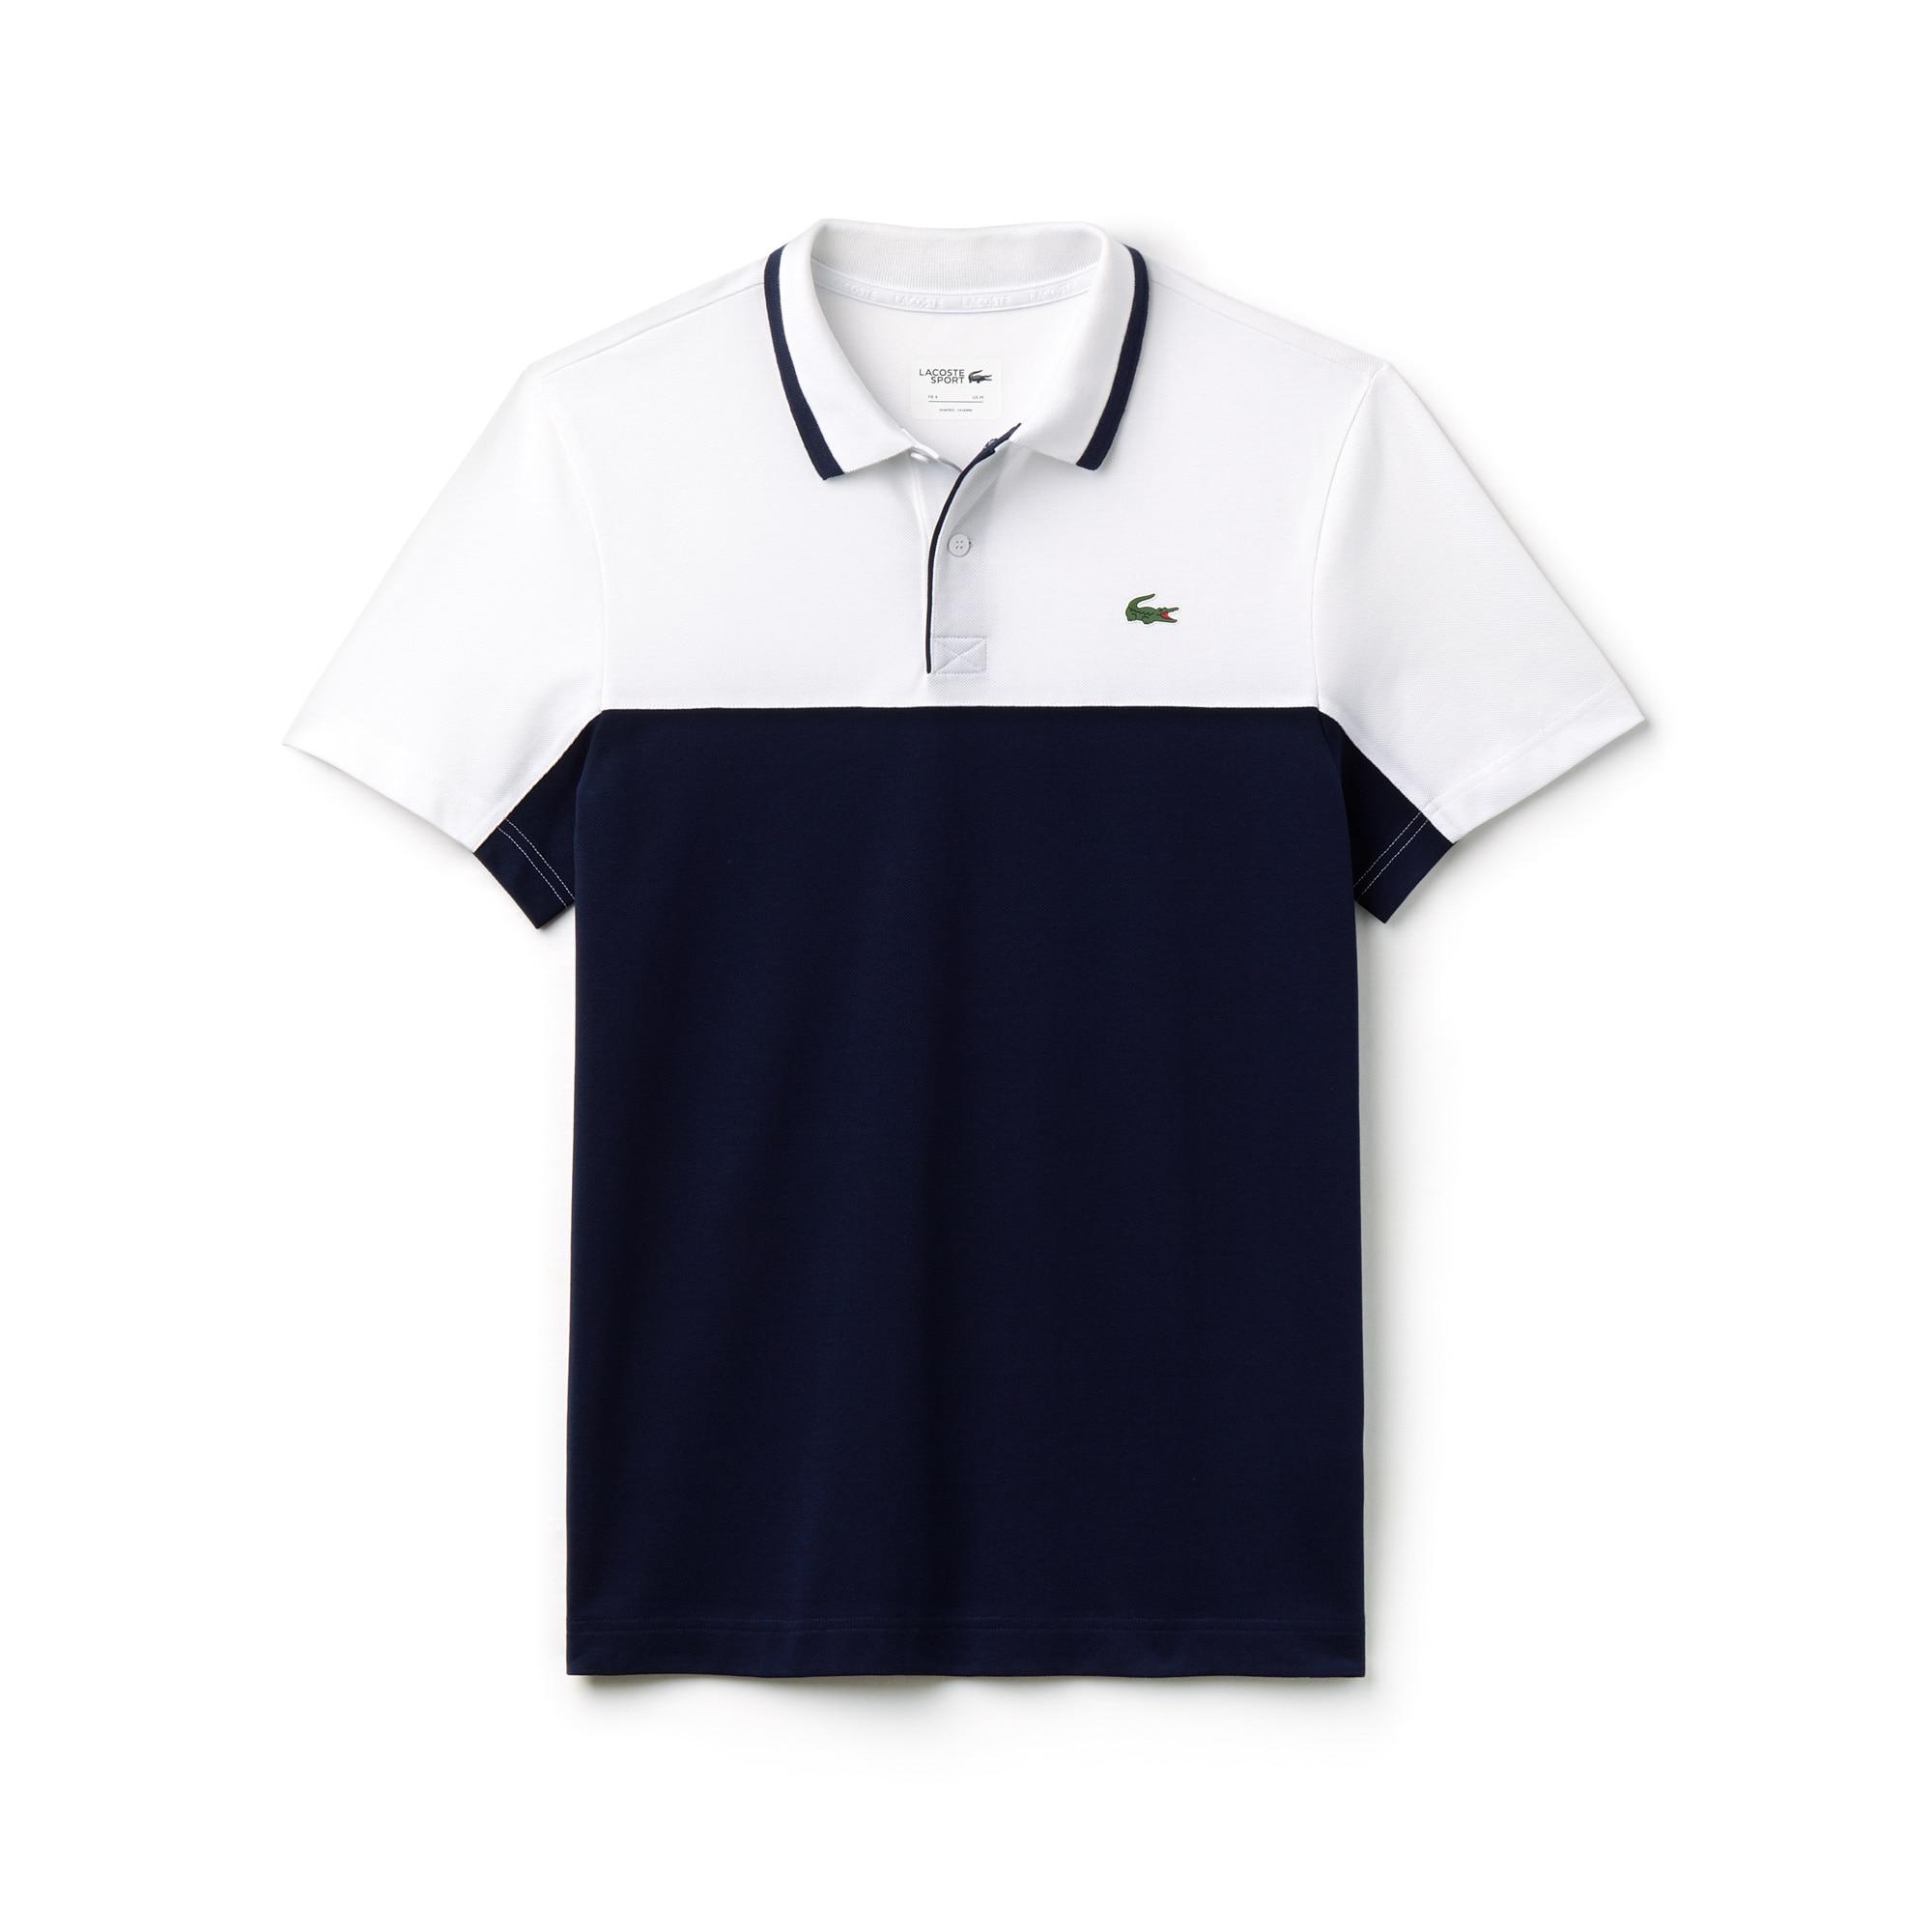 Polo Golf Lacoste SPORT in petit piqué tecnico color block